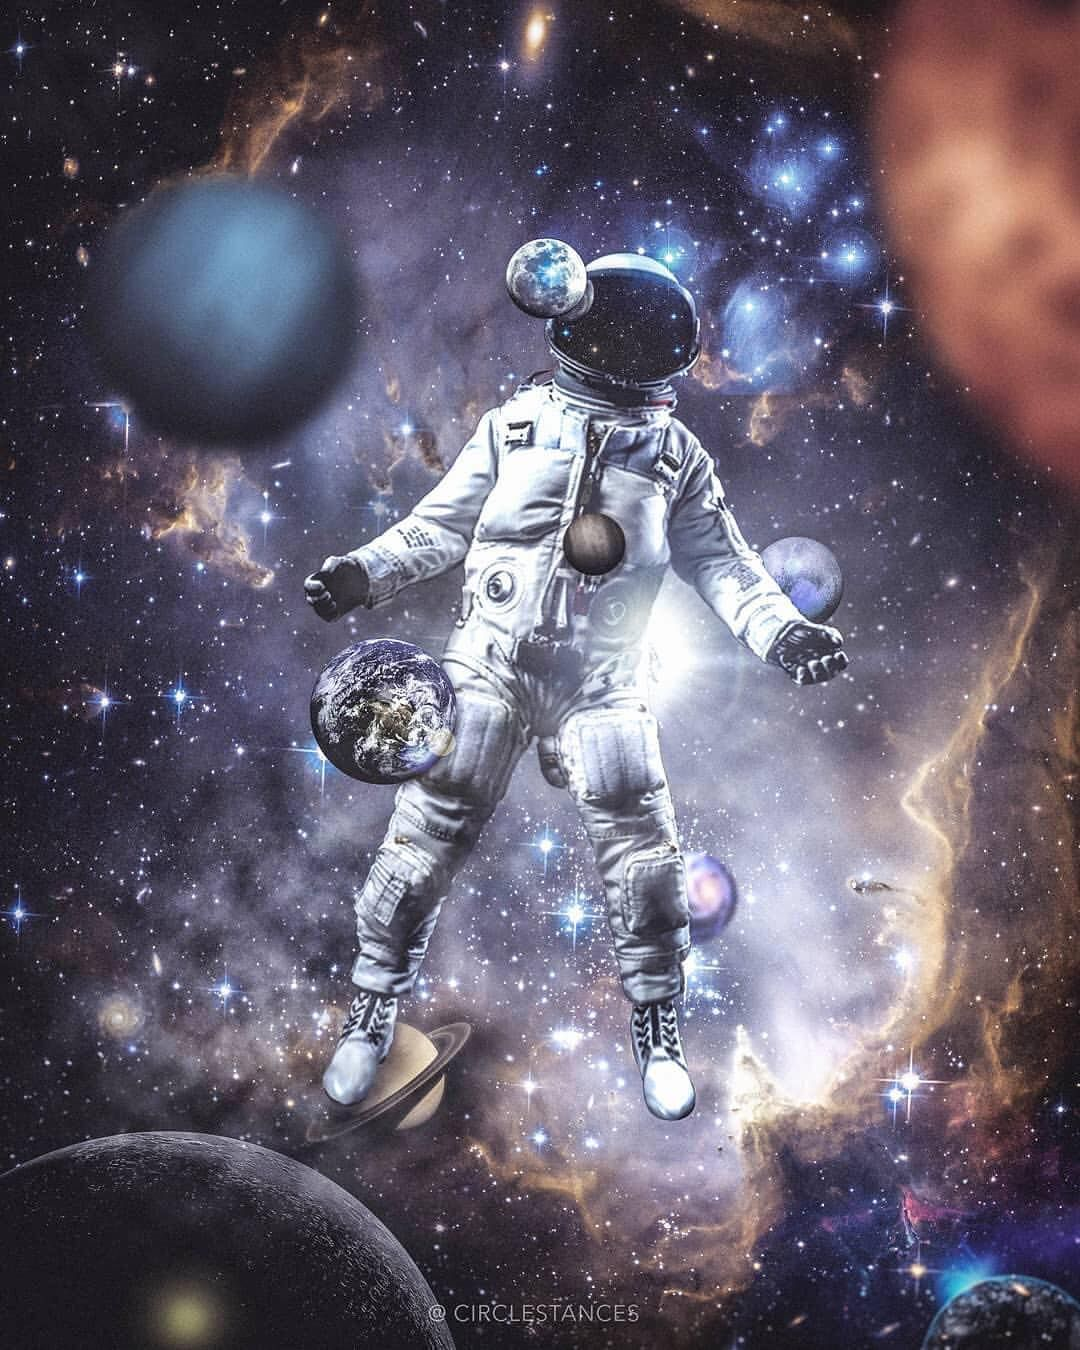 Lost In Space Artwor Space Art Space Art Gallery Astronaut Art